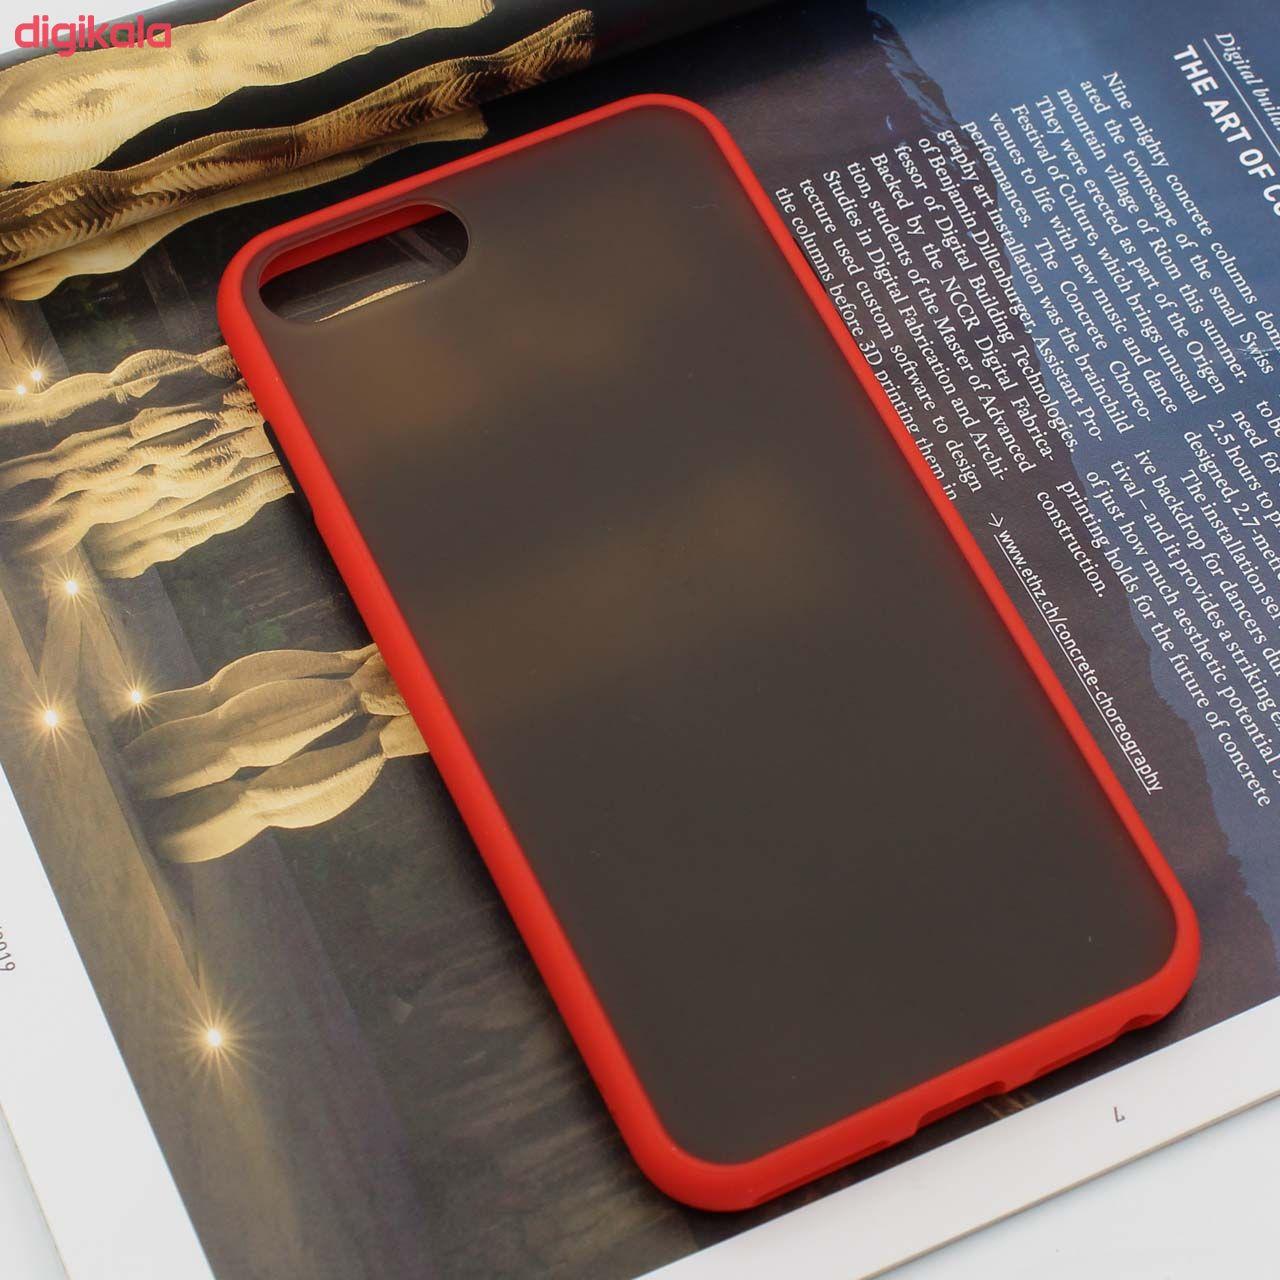 کاور کینگ پاور مدل M21 مناسب برای گوشی موبایل اپل iPhone 7 Plus/ 8 Plus main 1 3